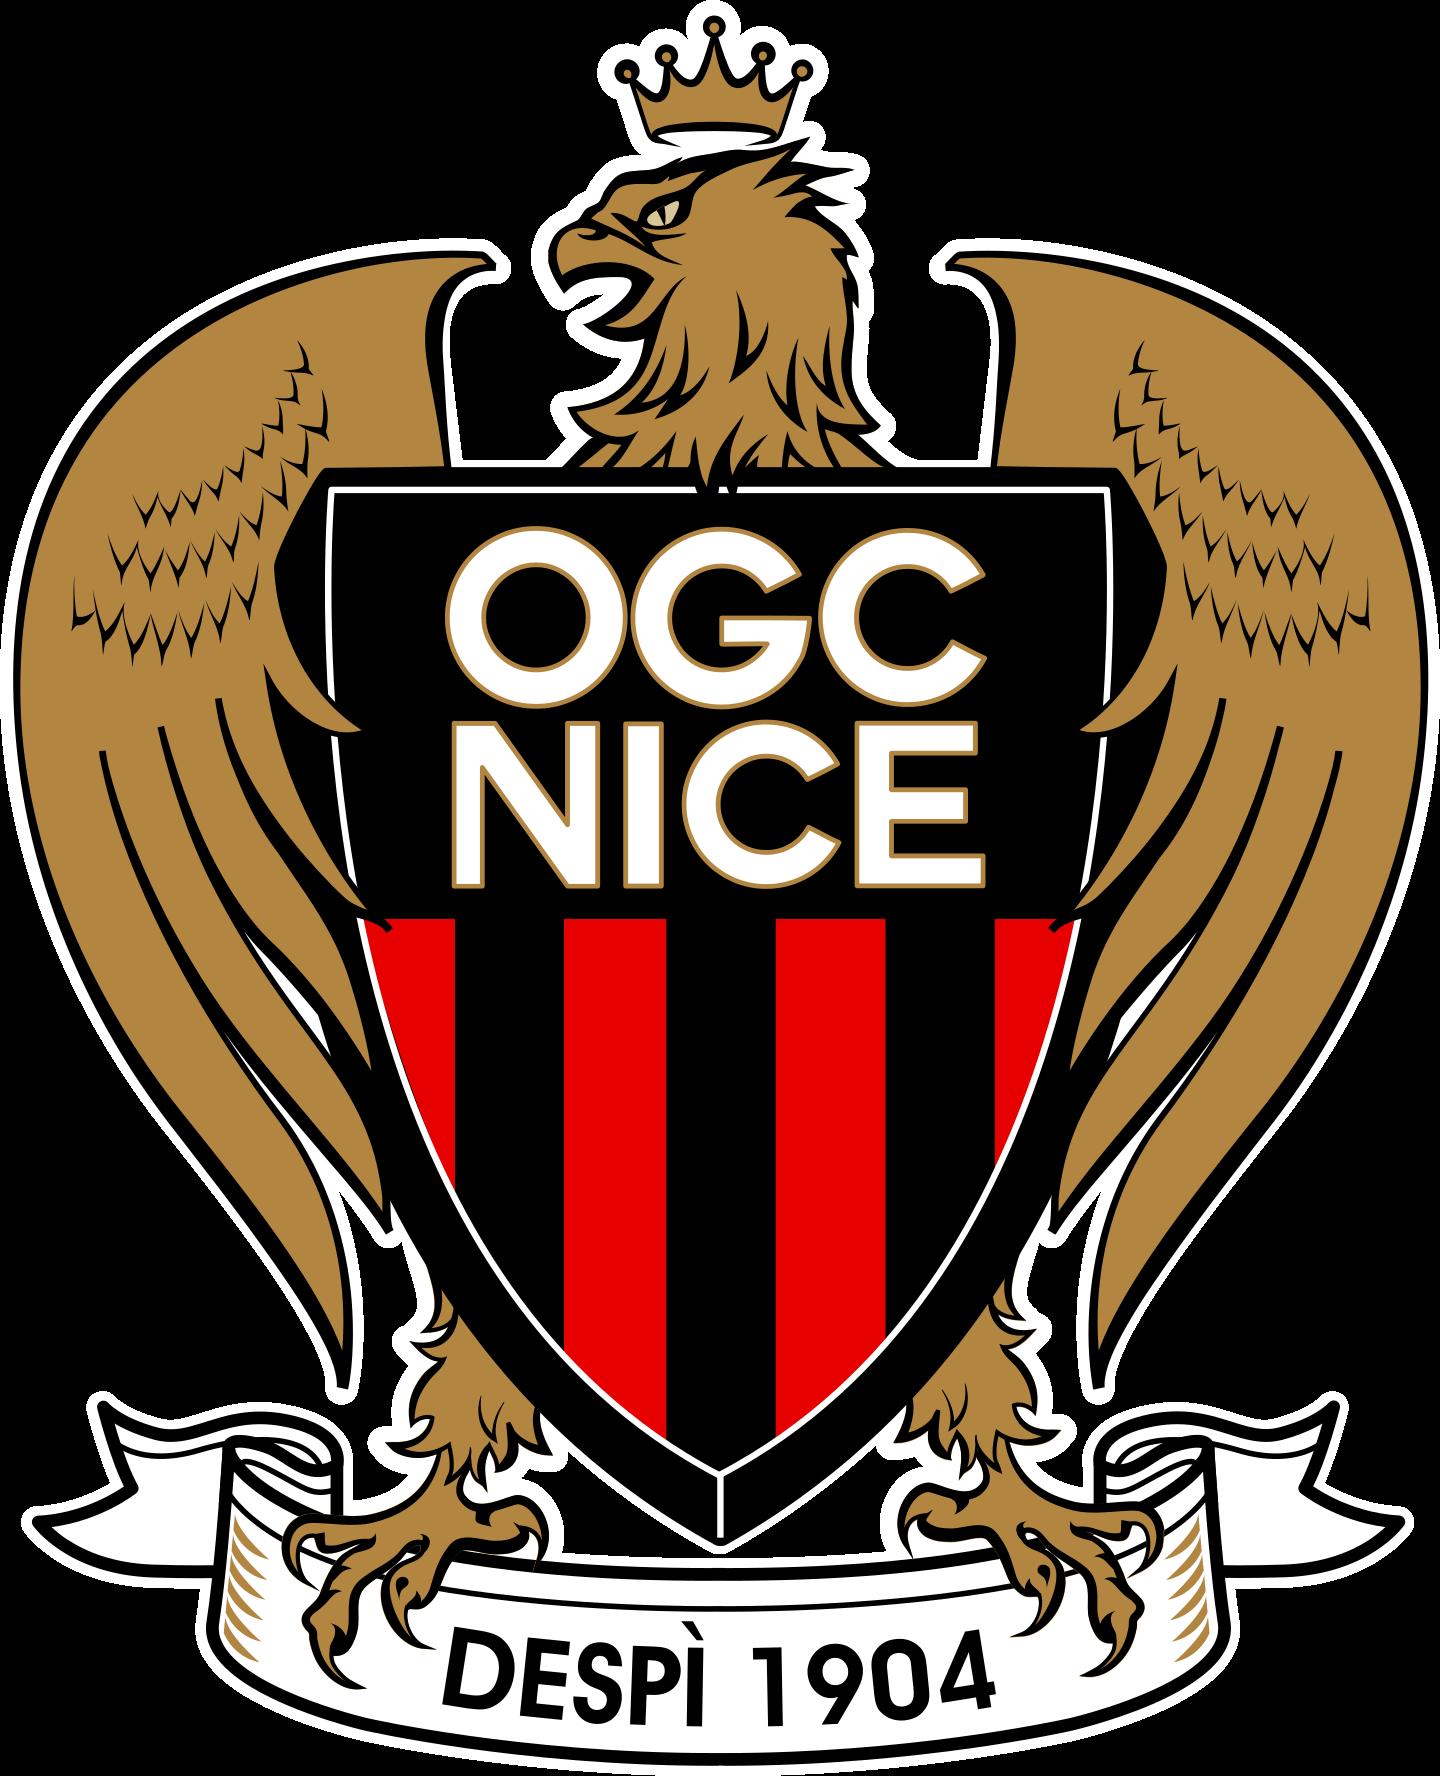 ogc-nice-logo-2